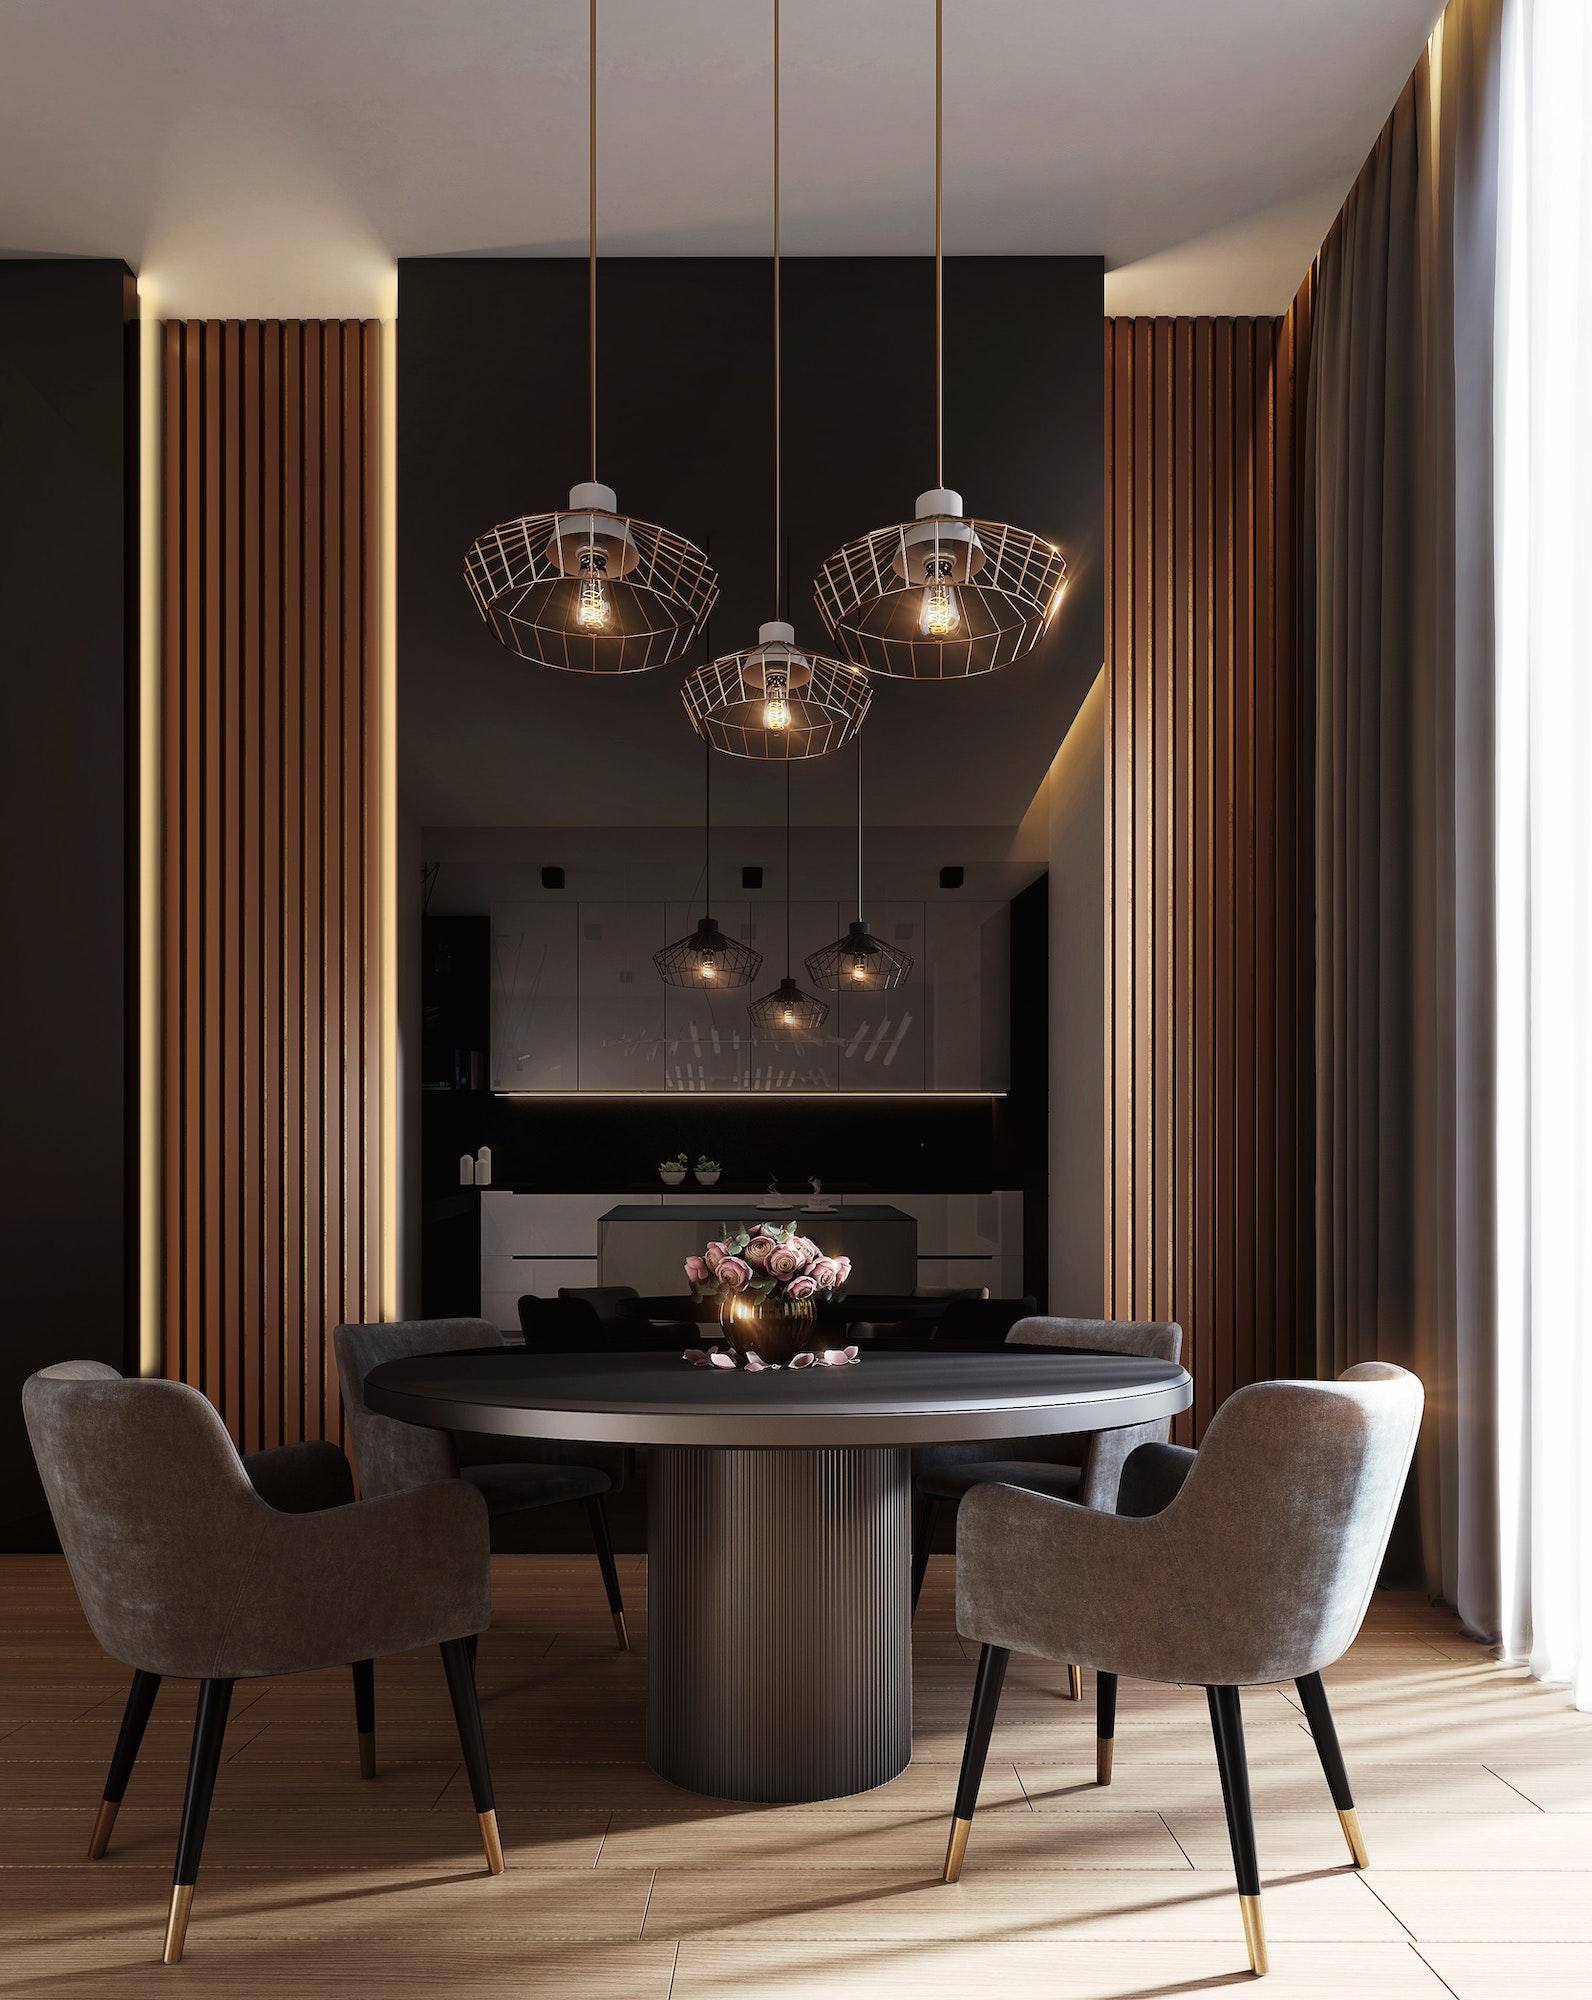 How To Start An Interior Design Business | Business Tips | Elle Blonde Luxury Lifestyle Destination Blog